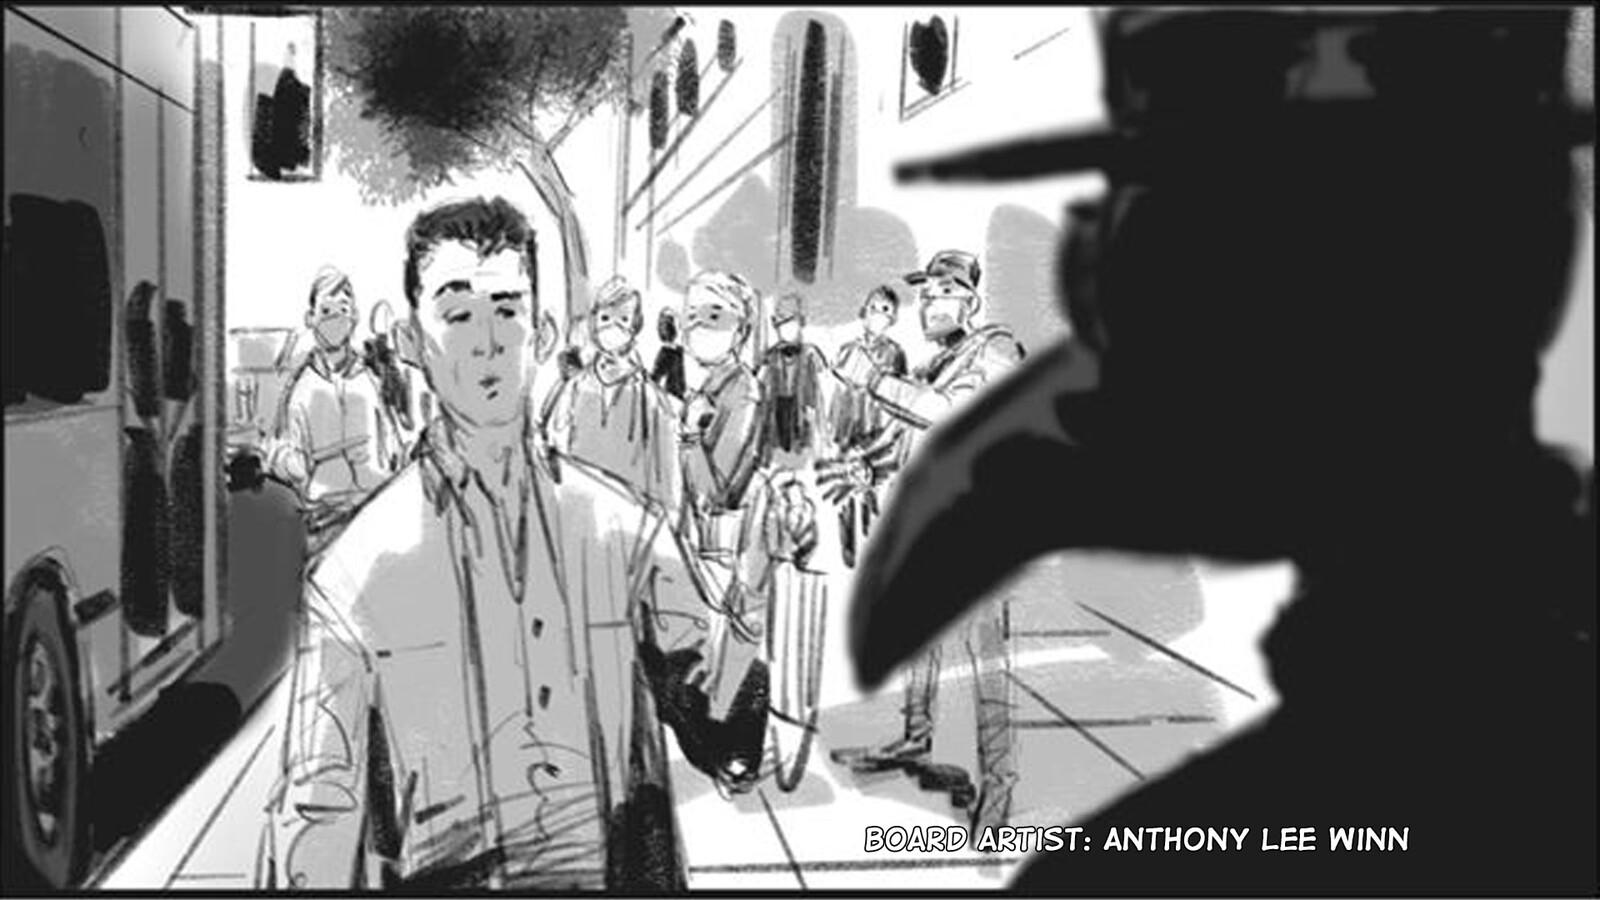 PANEL 19C: Anthony-Lee-Winn